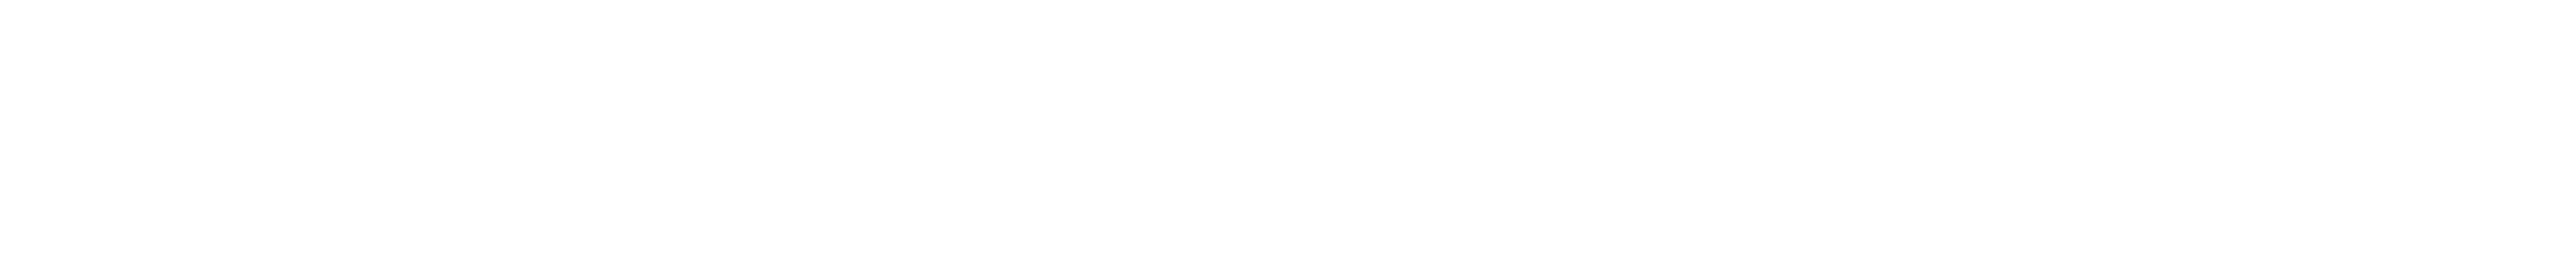 DESIGN_ANIMATION